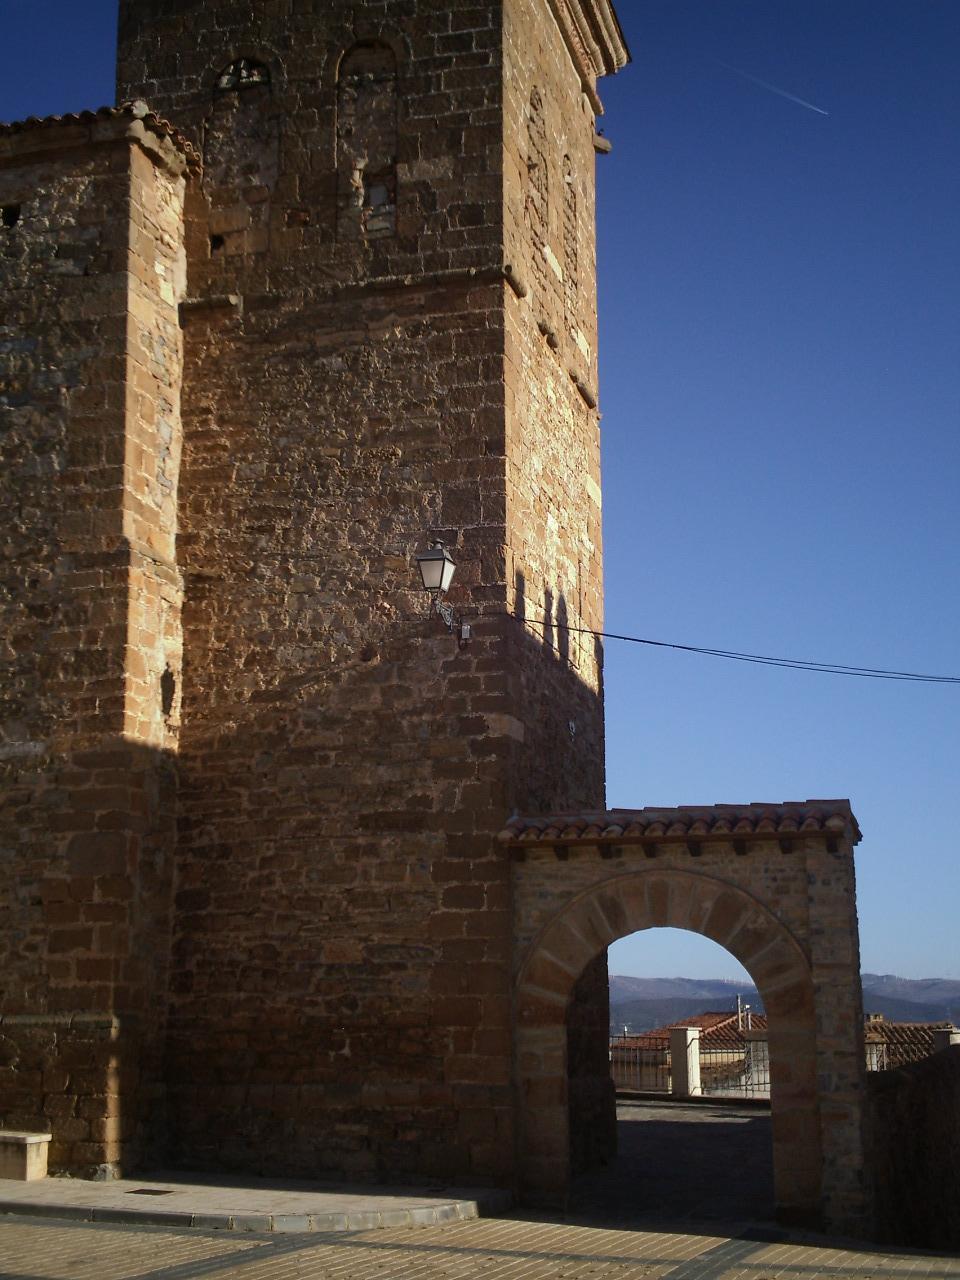 Castilruiz